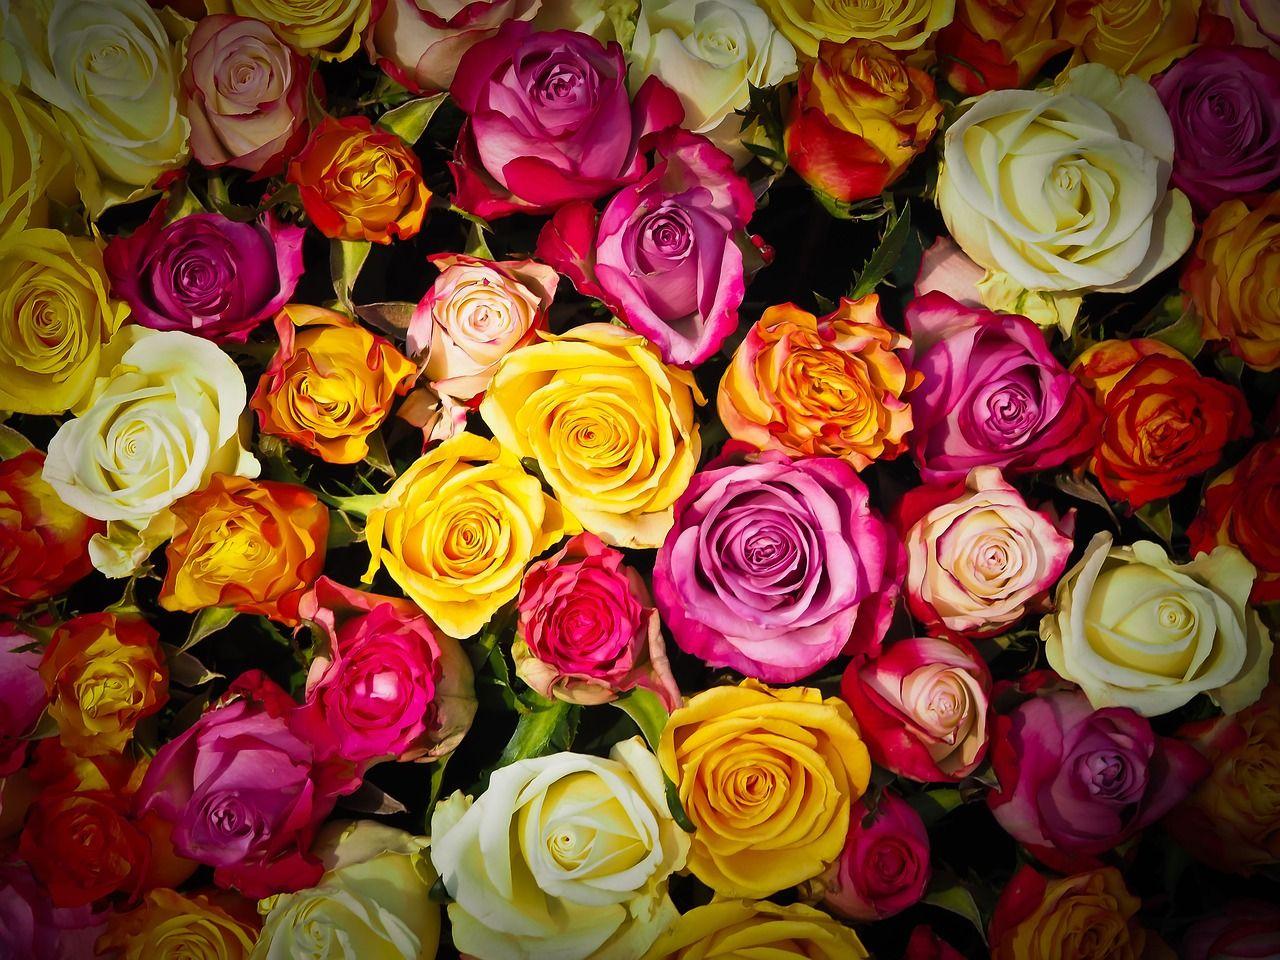 Roses and flowers dream interpretation dream power pinterest roses and flowers dream interpretation mightylinksfo